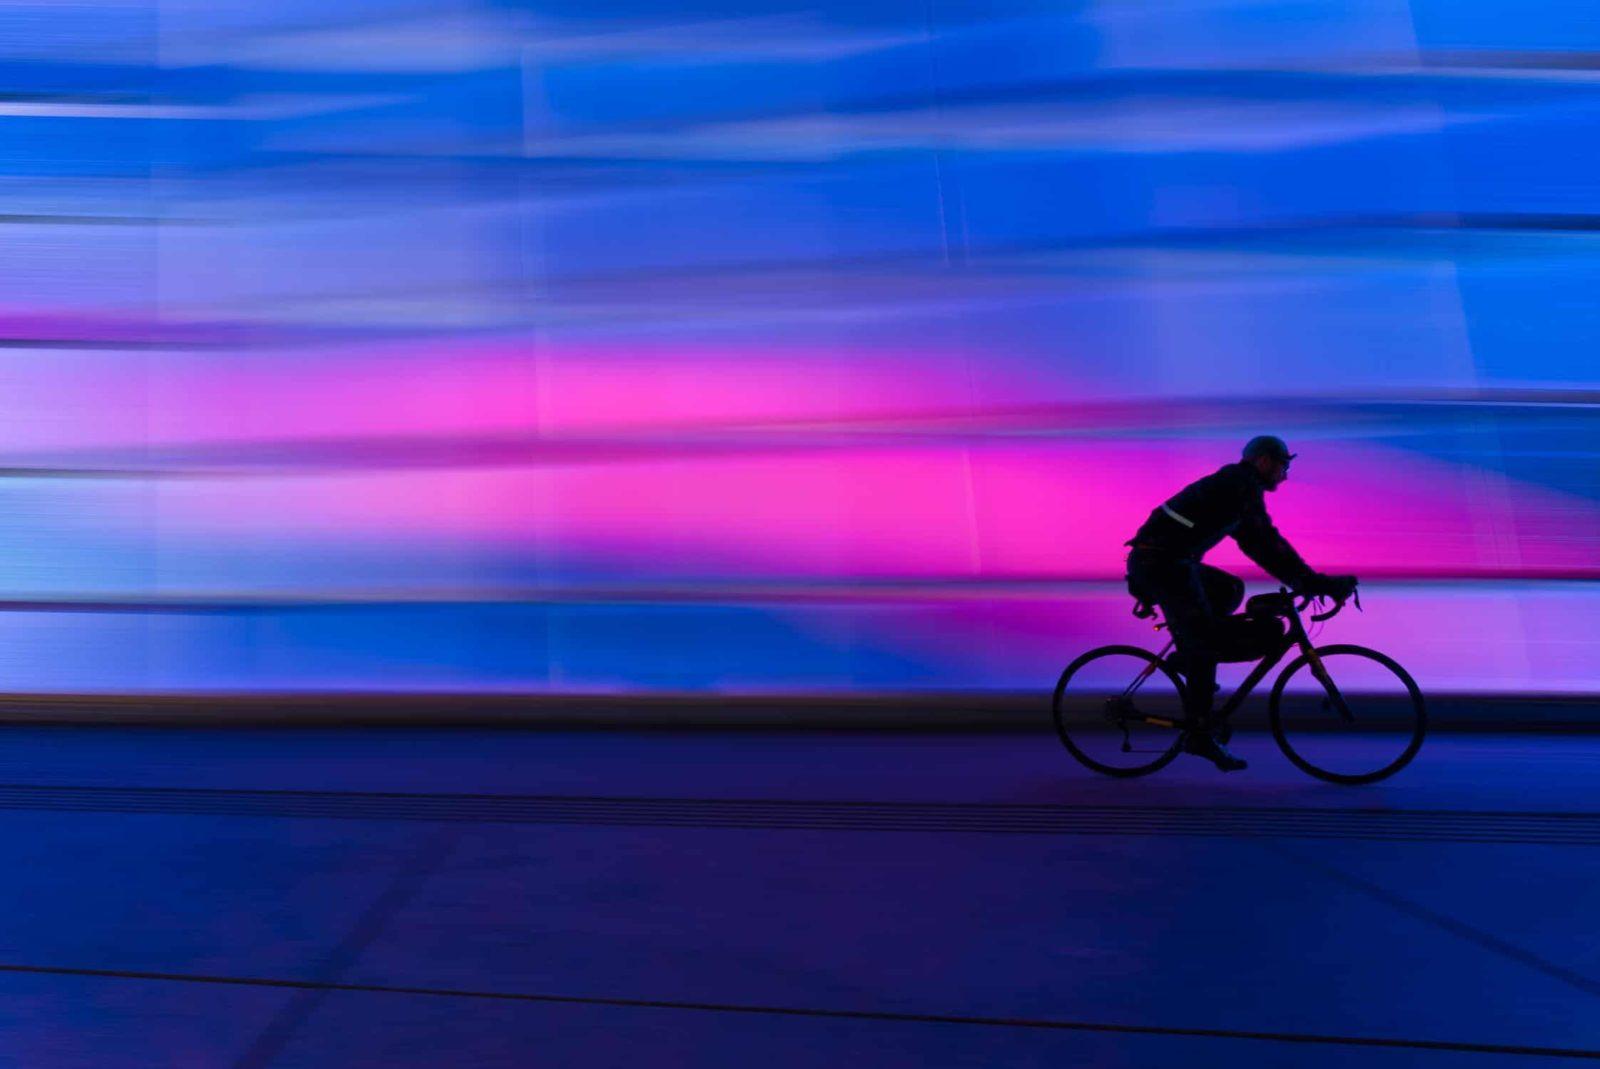 Bersepeda malam hari lebih seru